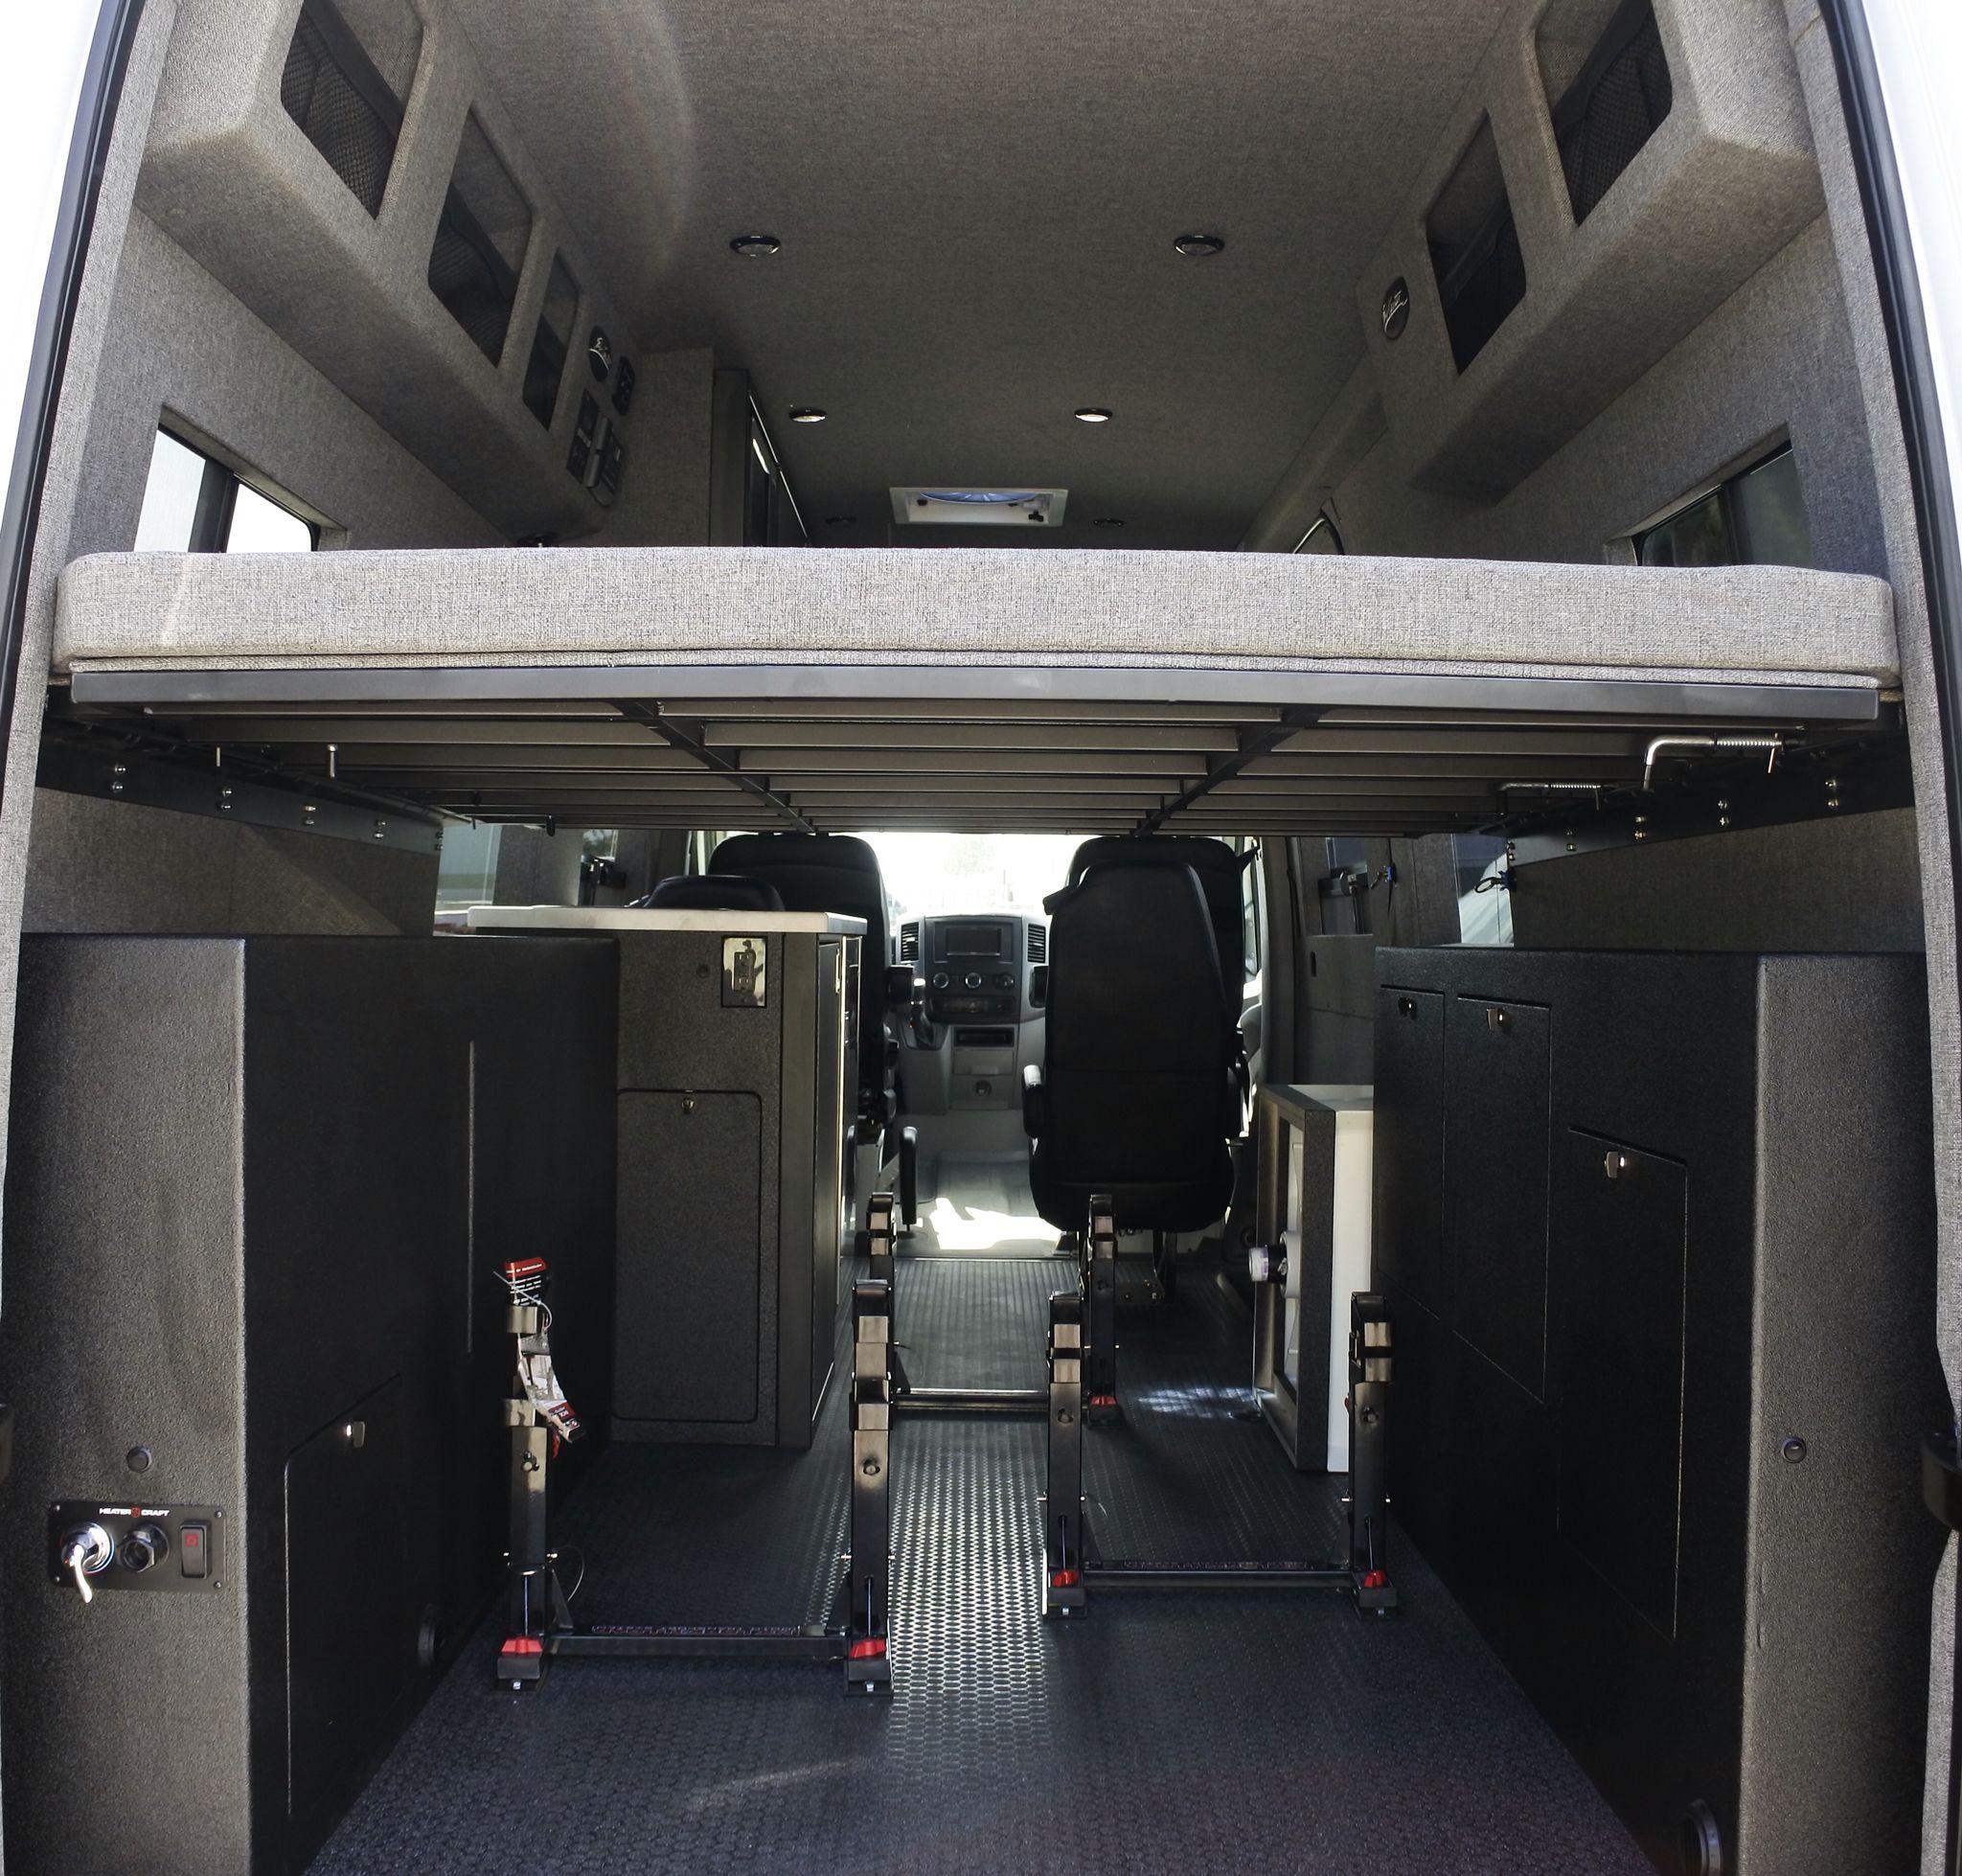 2018 Freightliner Sprinter 2500 Cargo Interior: Huntington Beach, California